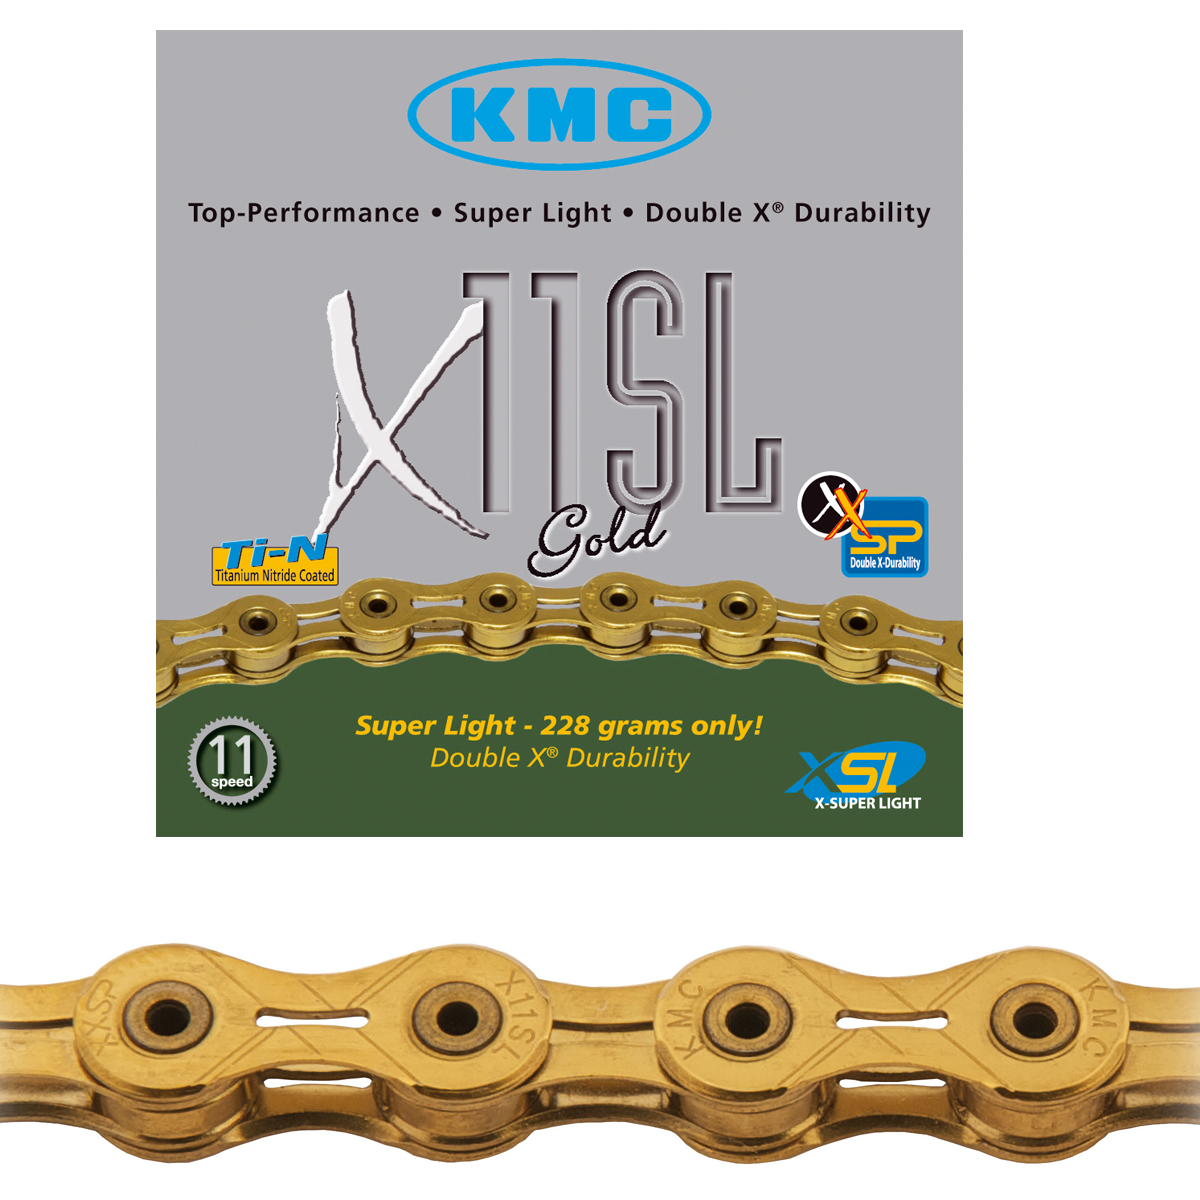 Chaîne vélo KMC 11 vitesses X11SL-TiN or super léger 112 maillons